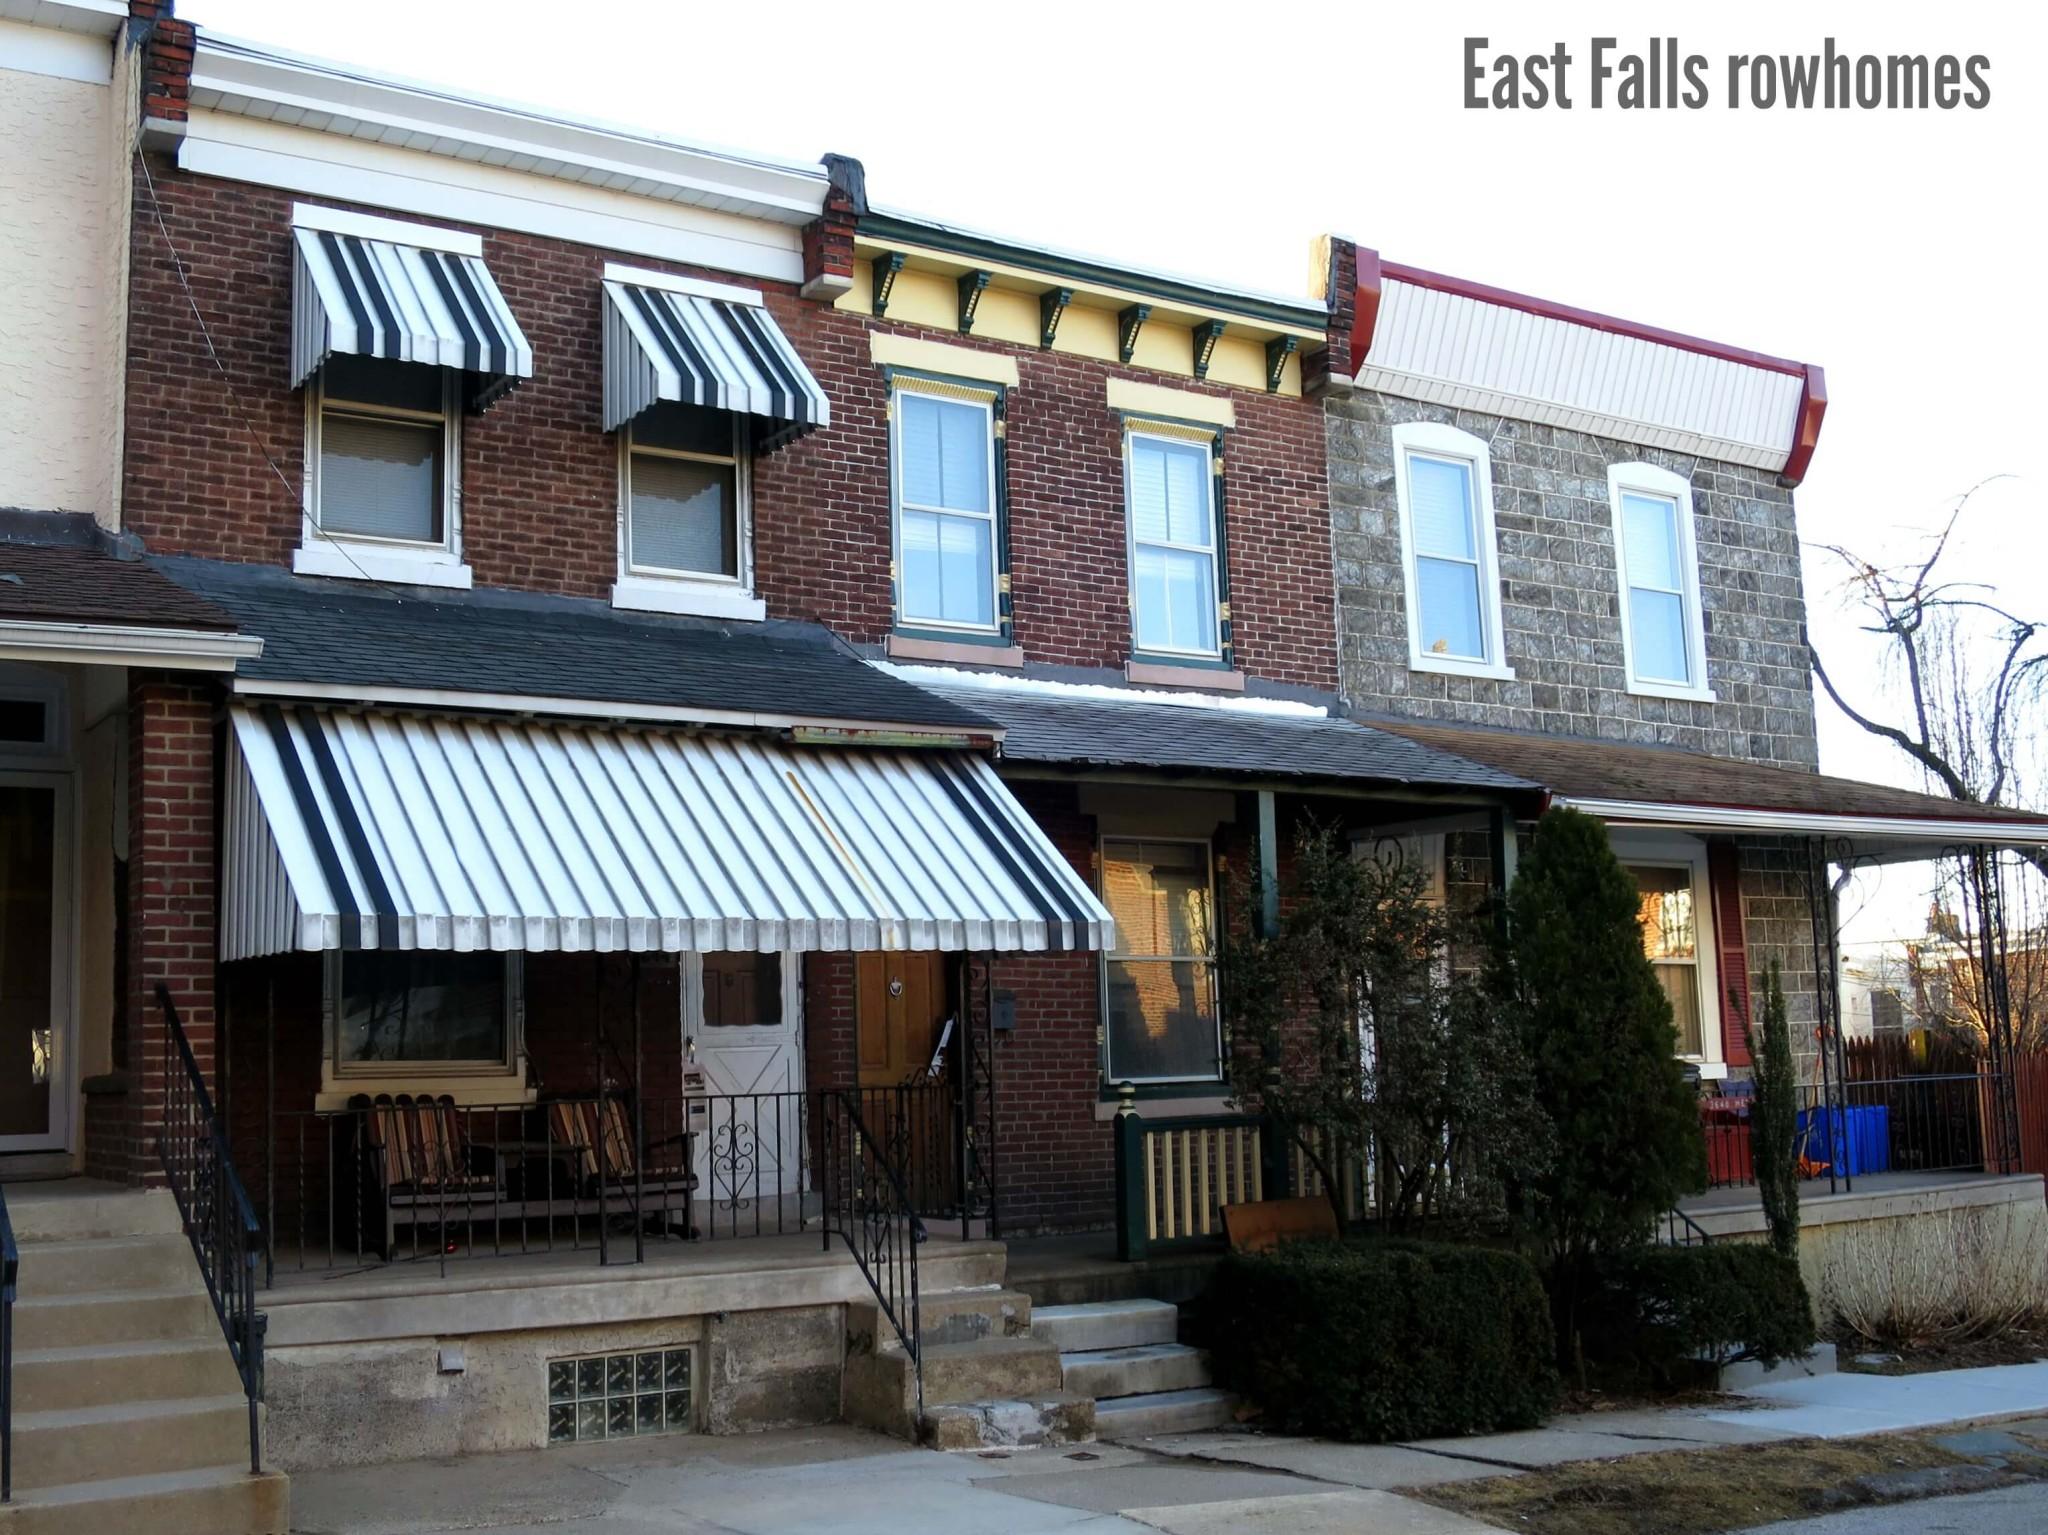 EastFallsLocal 3-12 Merrick rowhomes triple